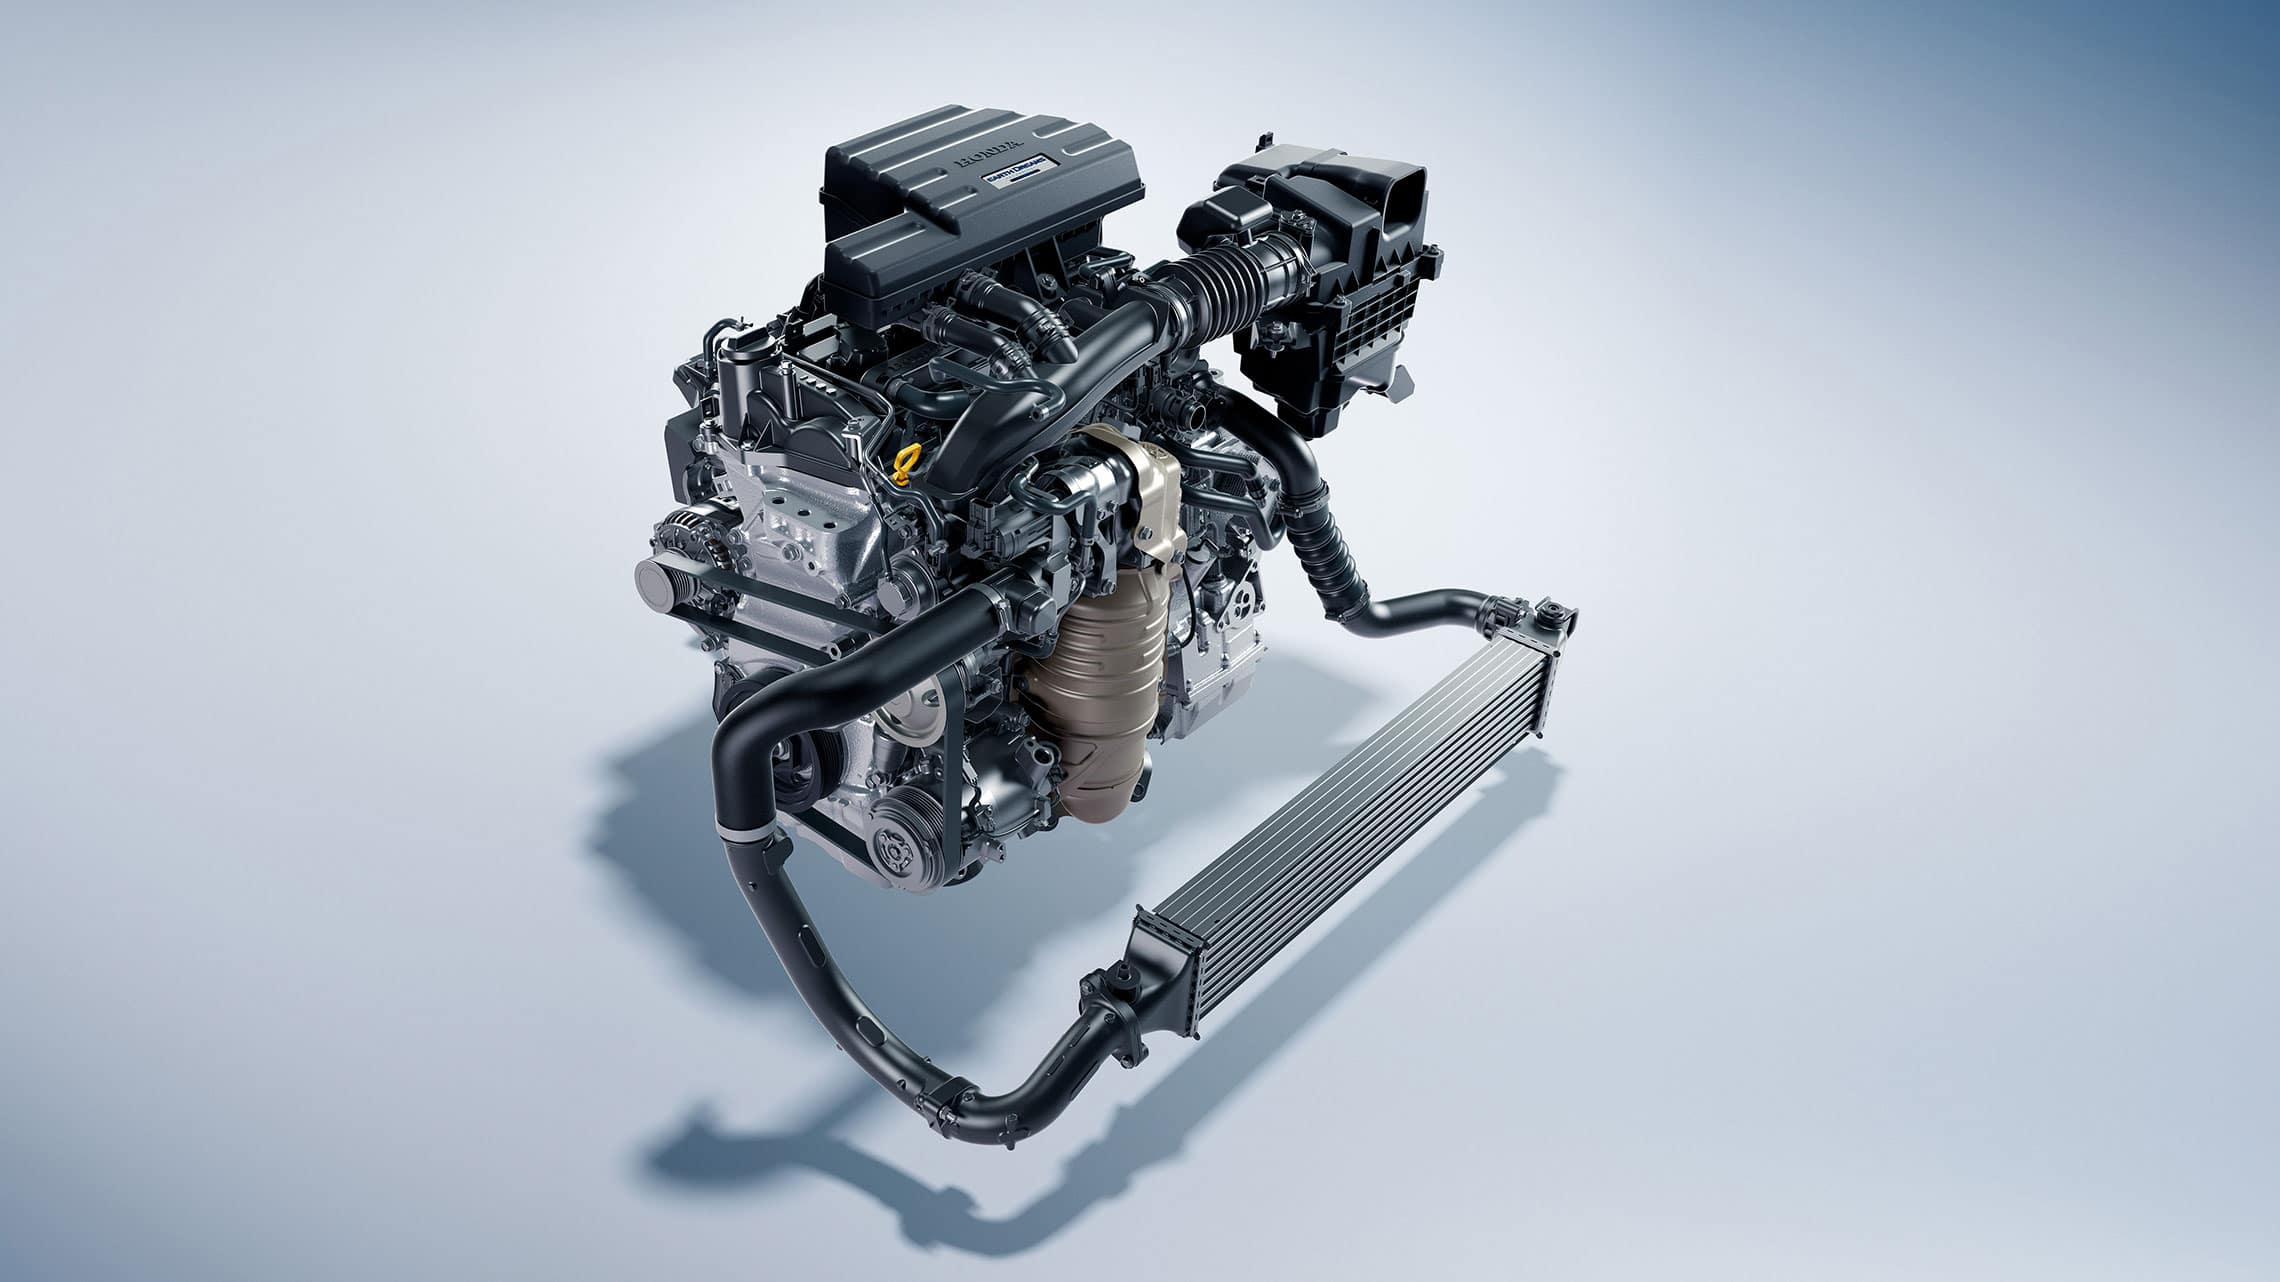 Detalle del motor turboalimentado de 1.5L en la Honda CR-V 2020